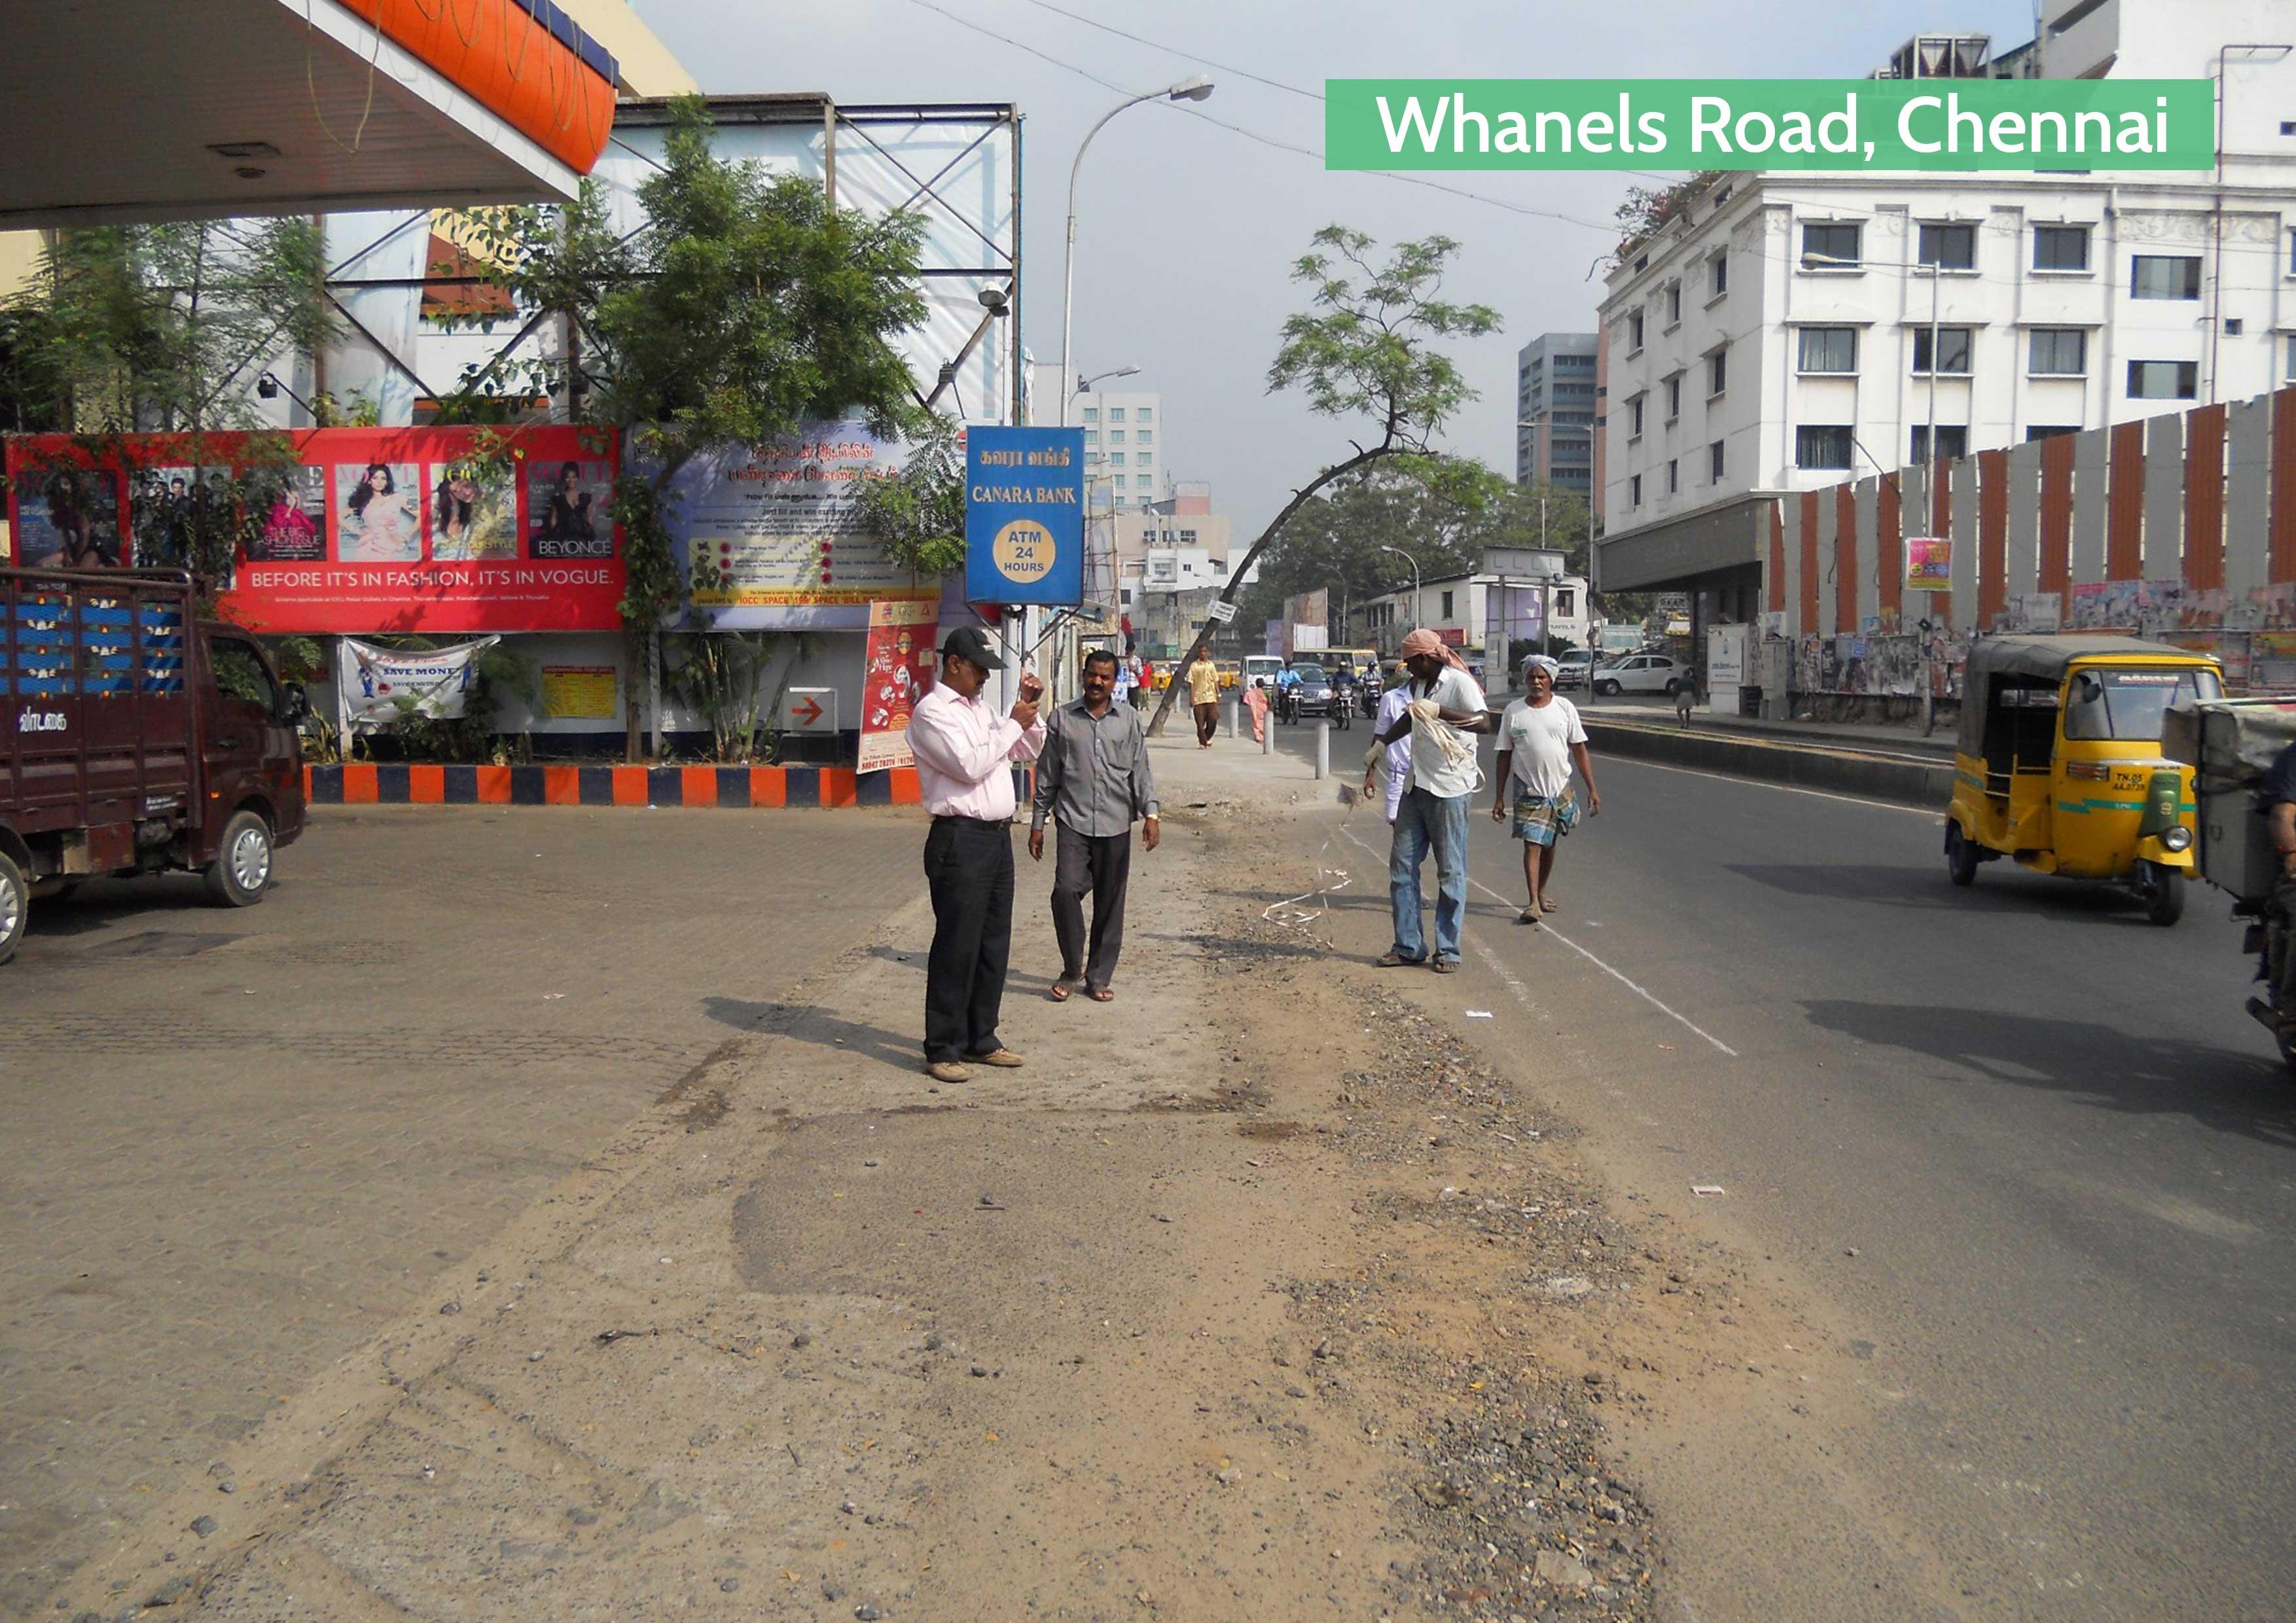 Before-Whanels Road, Chennai